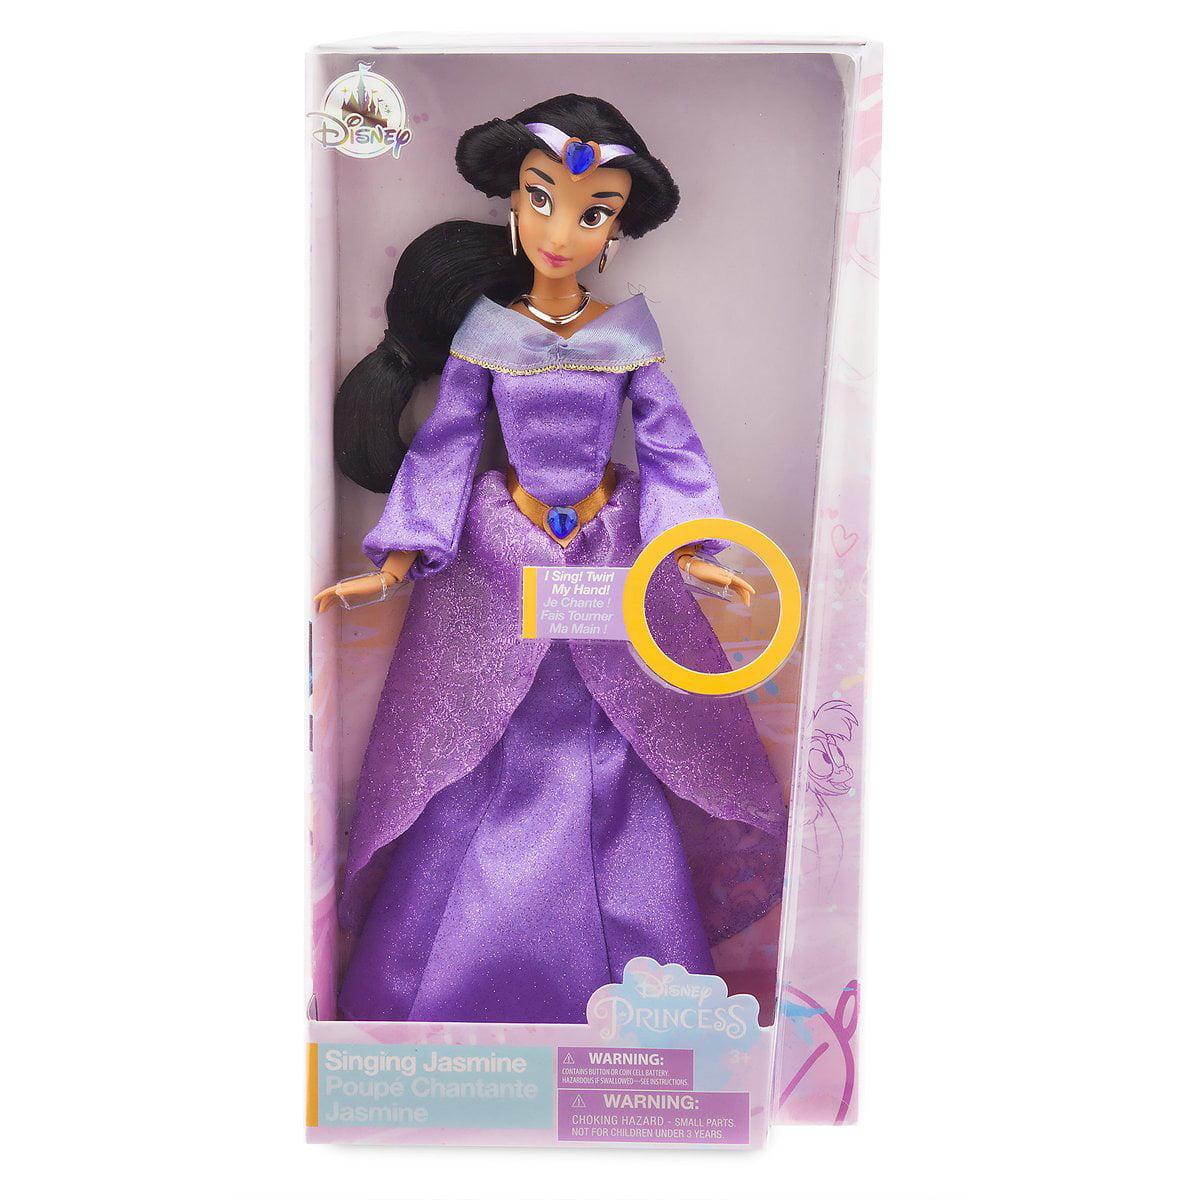 Disney Princess Jasmine Singing Doll A Whole New World New with Box